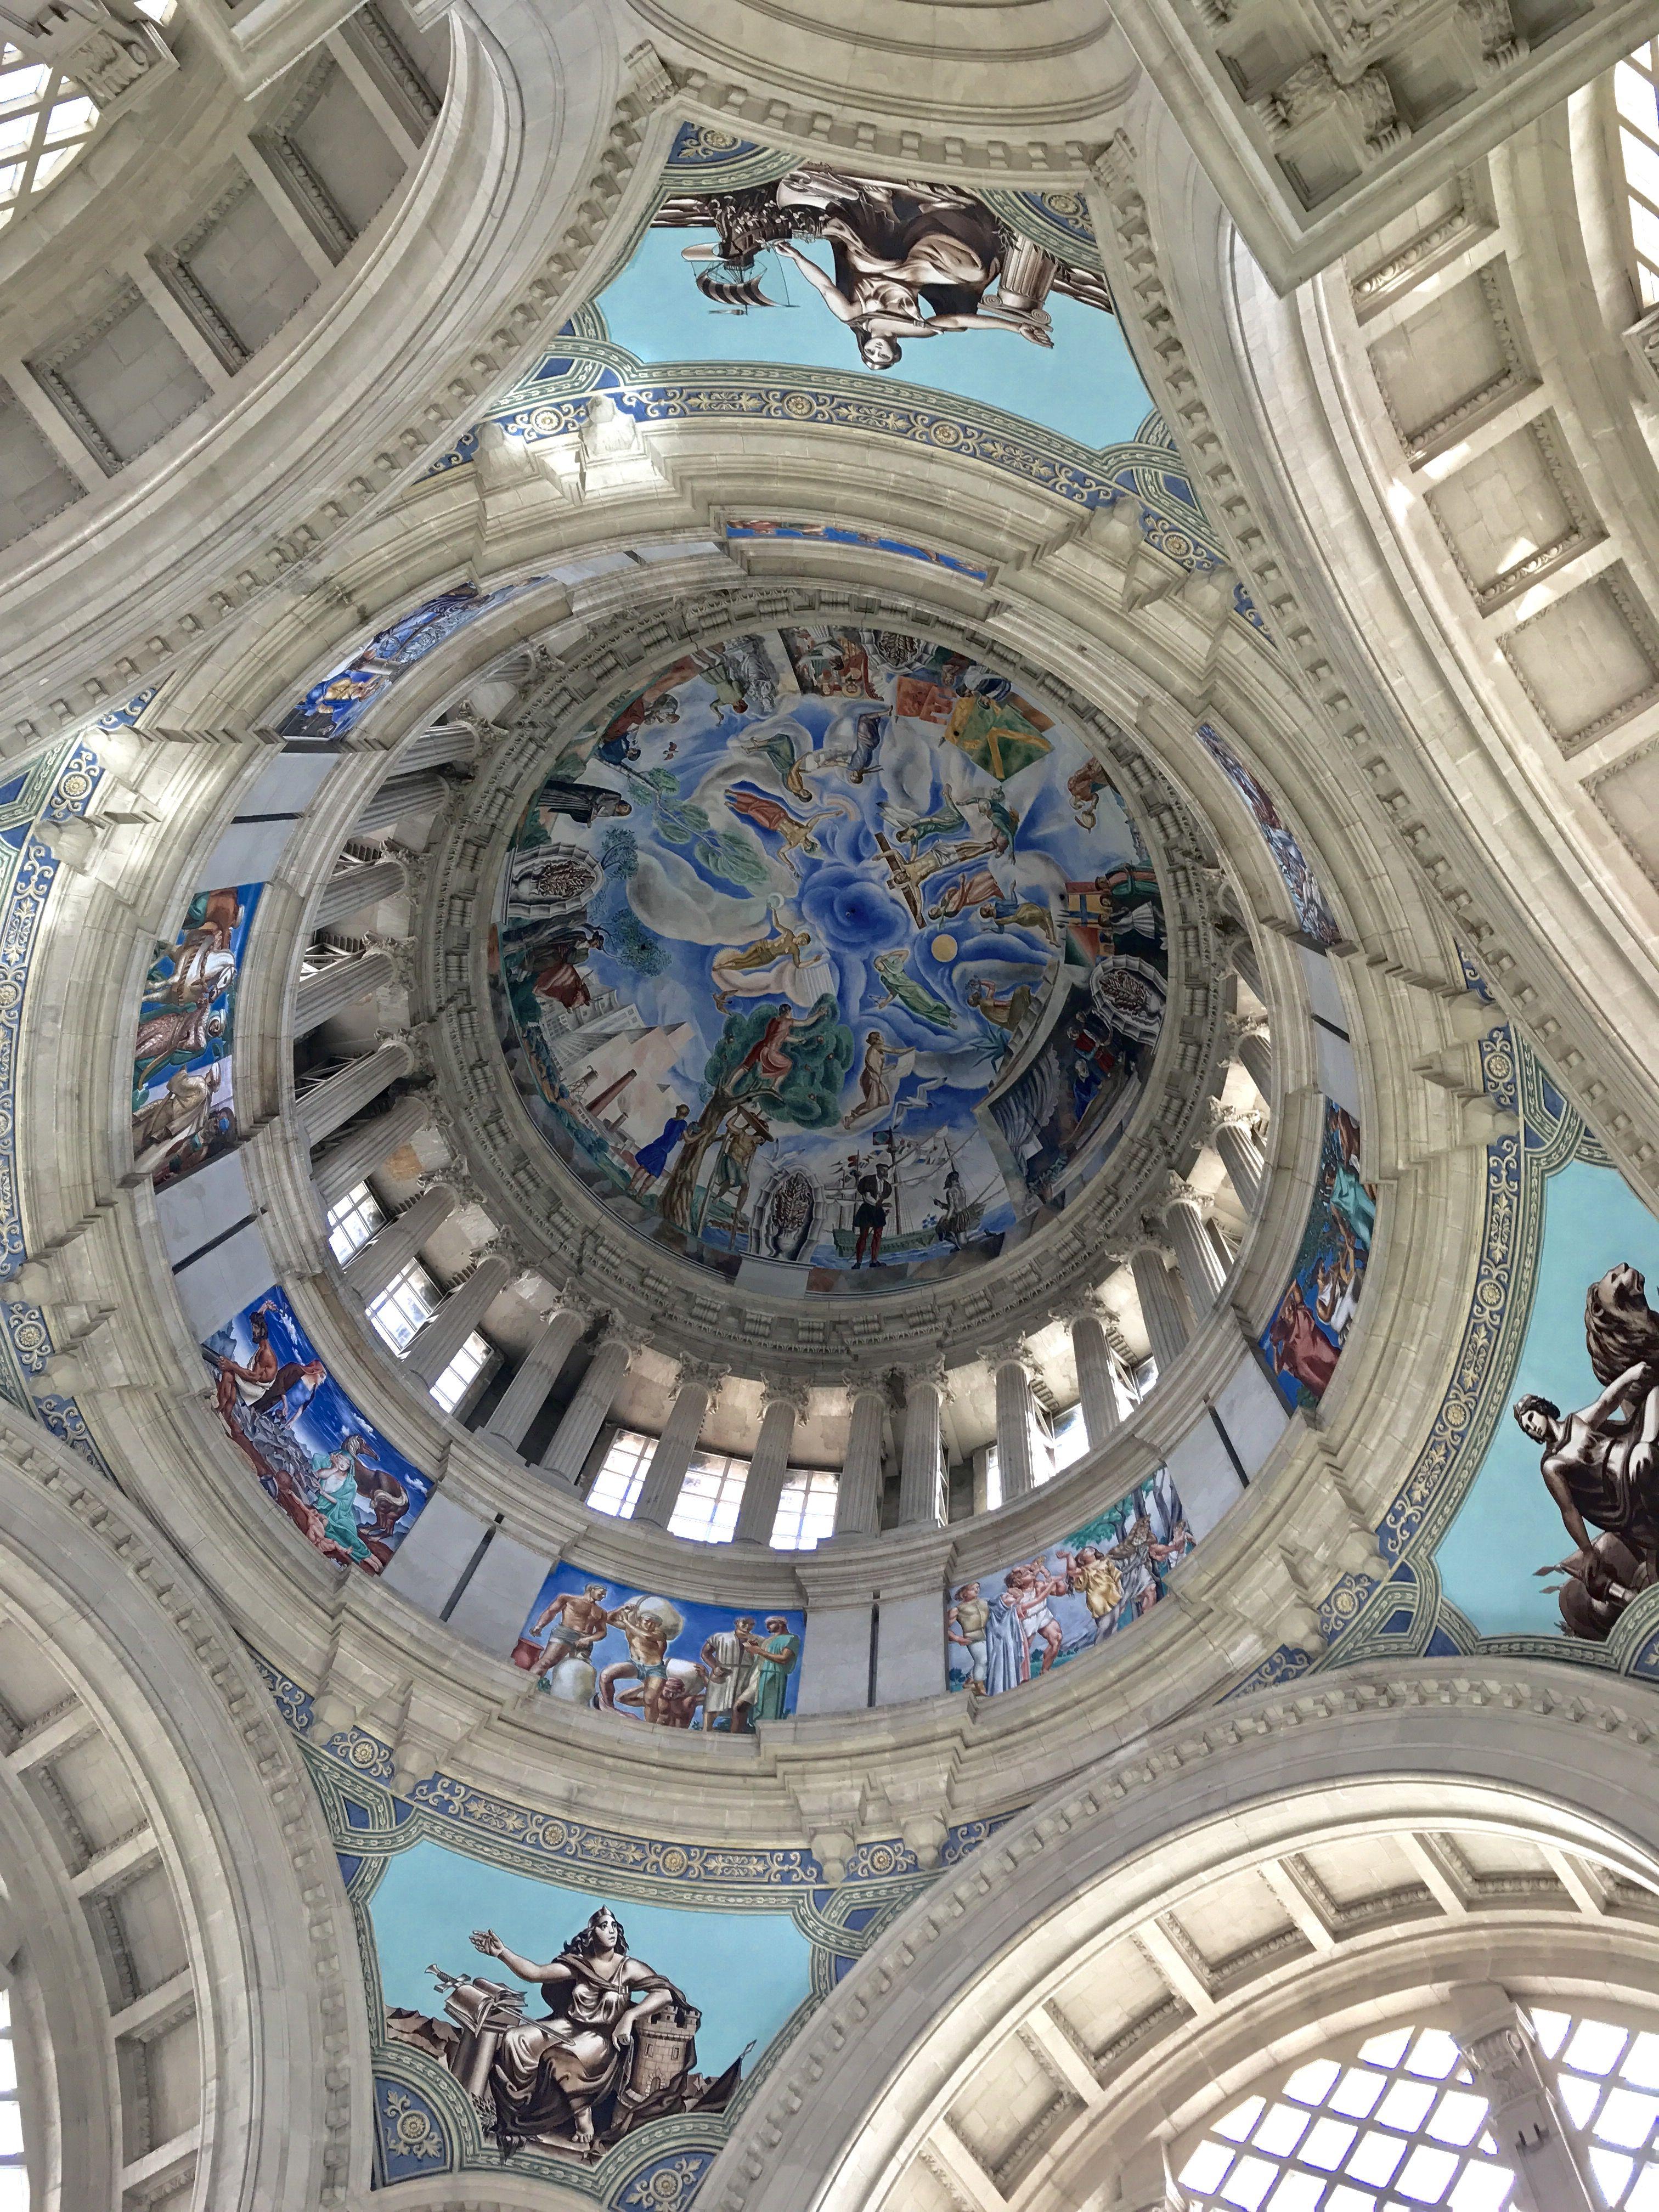 Dome from museu nacional dart de catalunya aerial